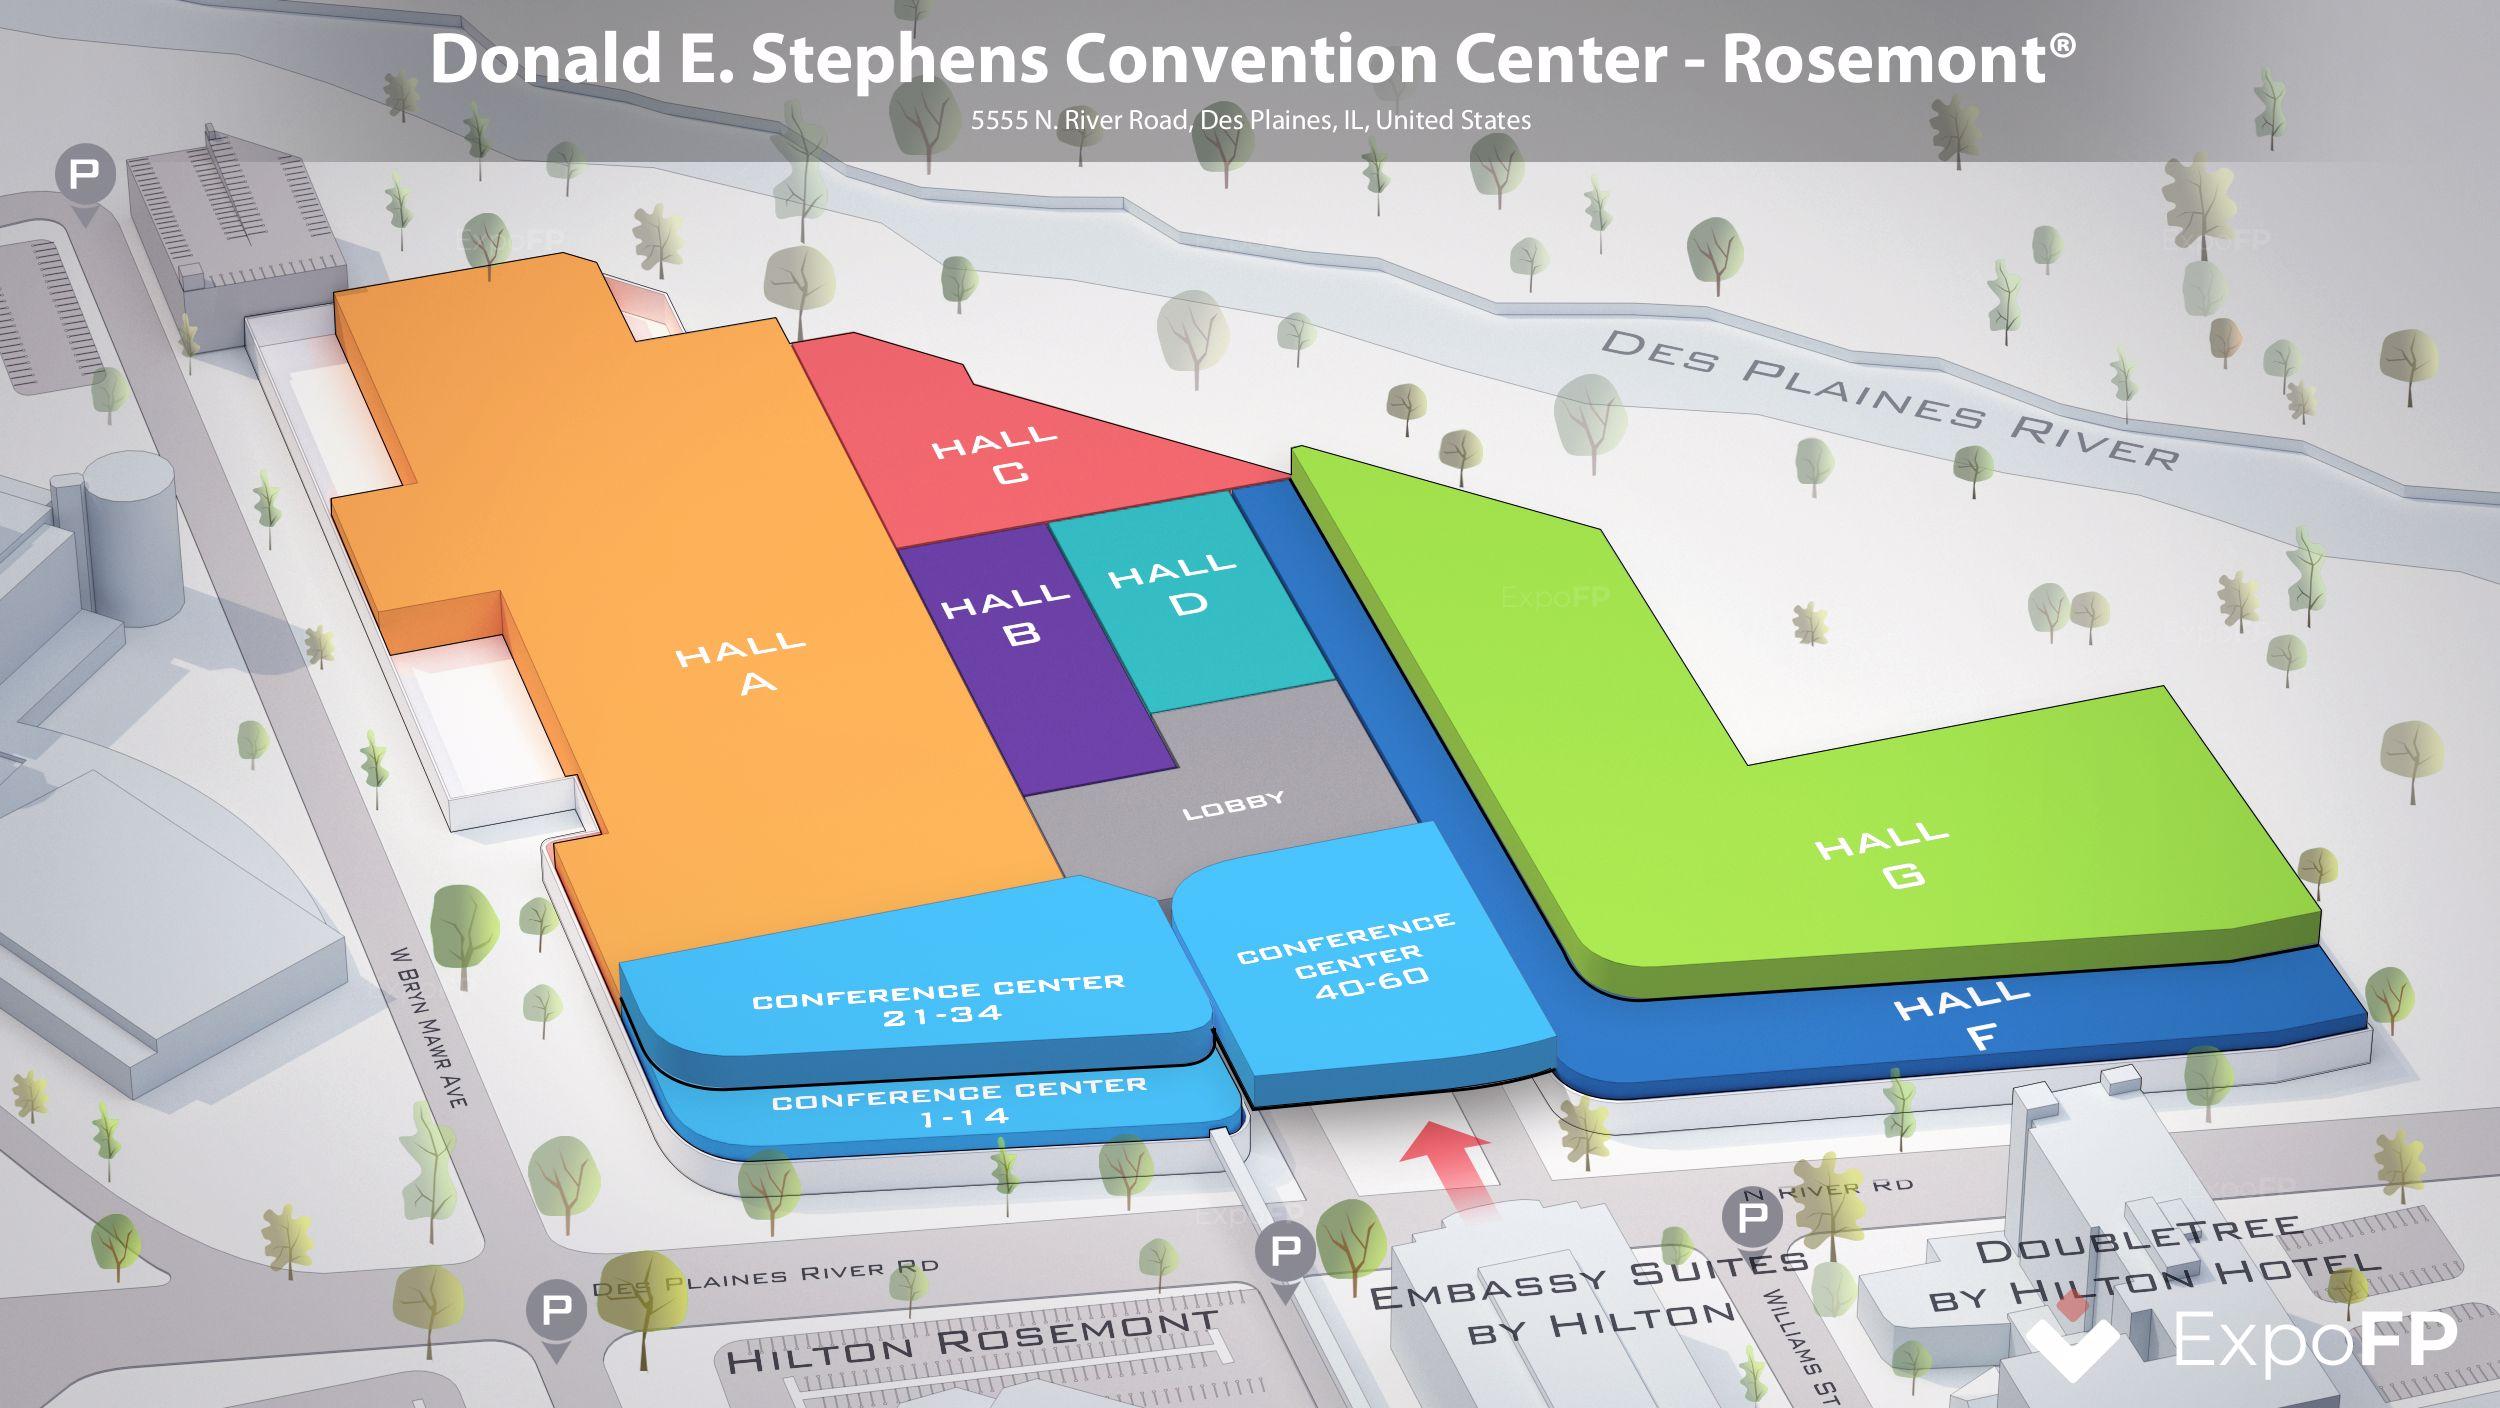 Chicago Convention Calendar 2022.Donald E Stephens Convention Center Rosemont Floor Plan